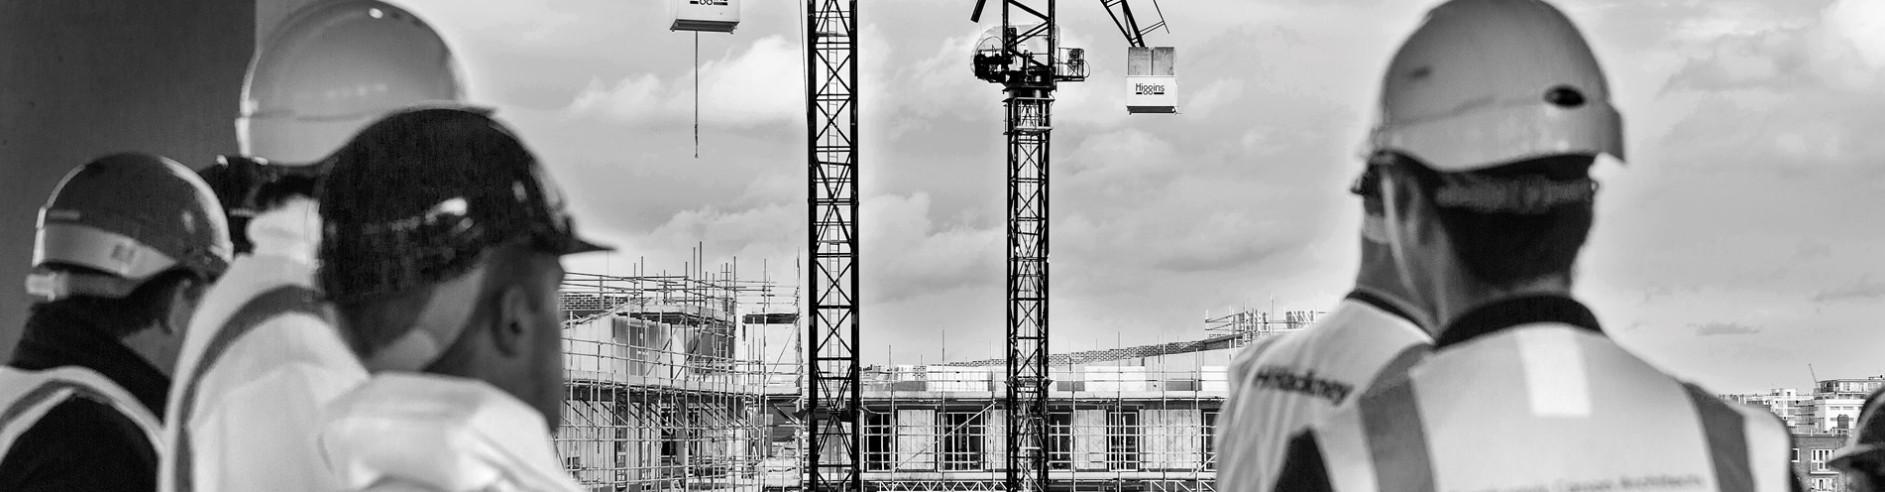 Higgins Construction PLC | LinkedIn